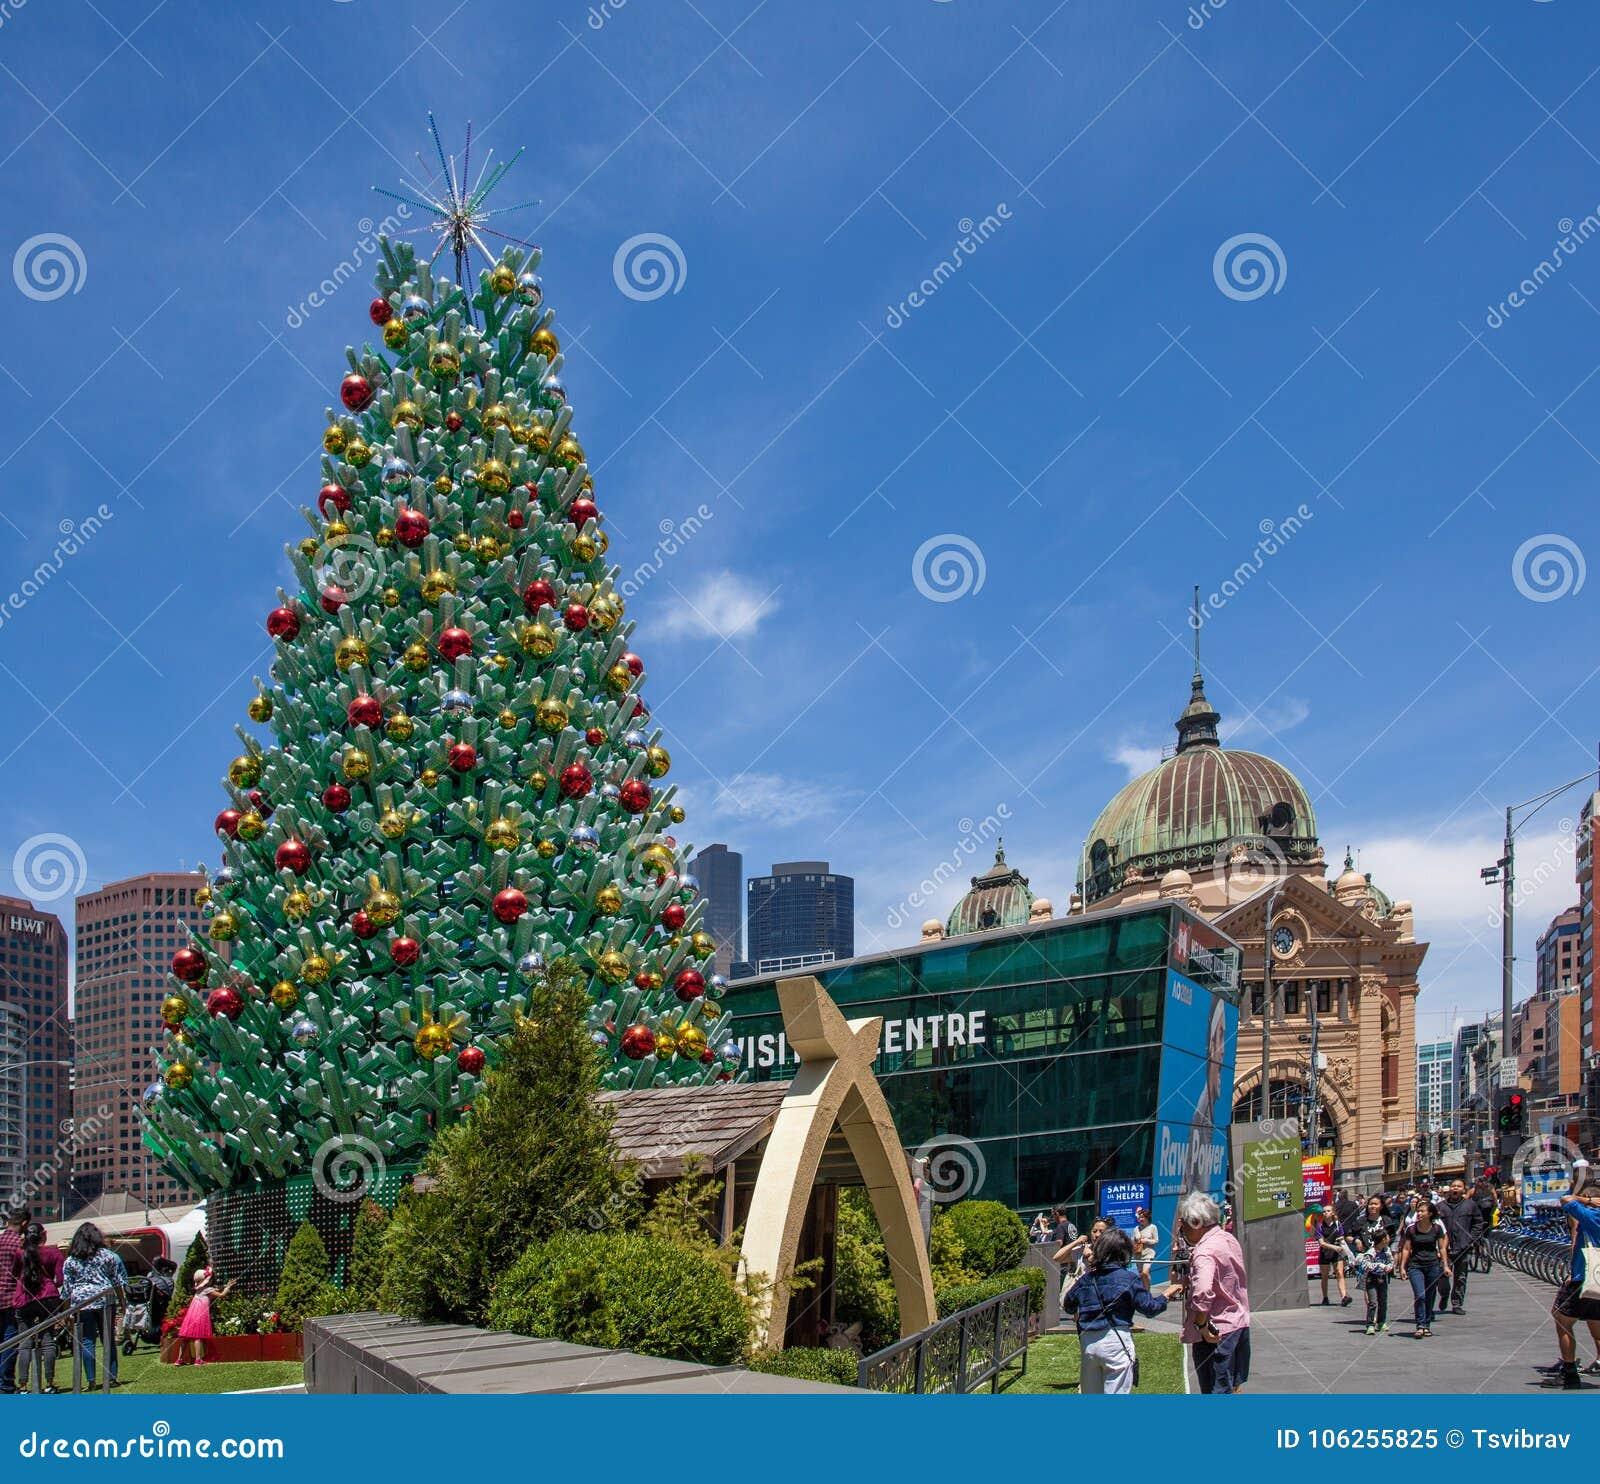 Christmas Trees Melbourne: December 16, 2017: Huge Beautiful